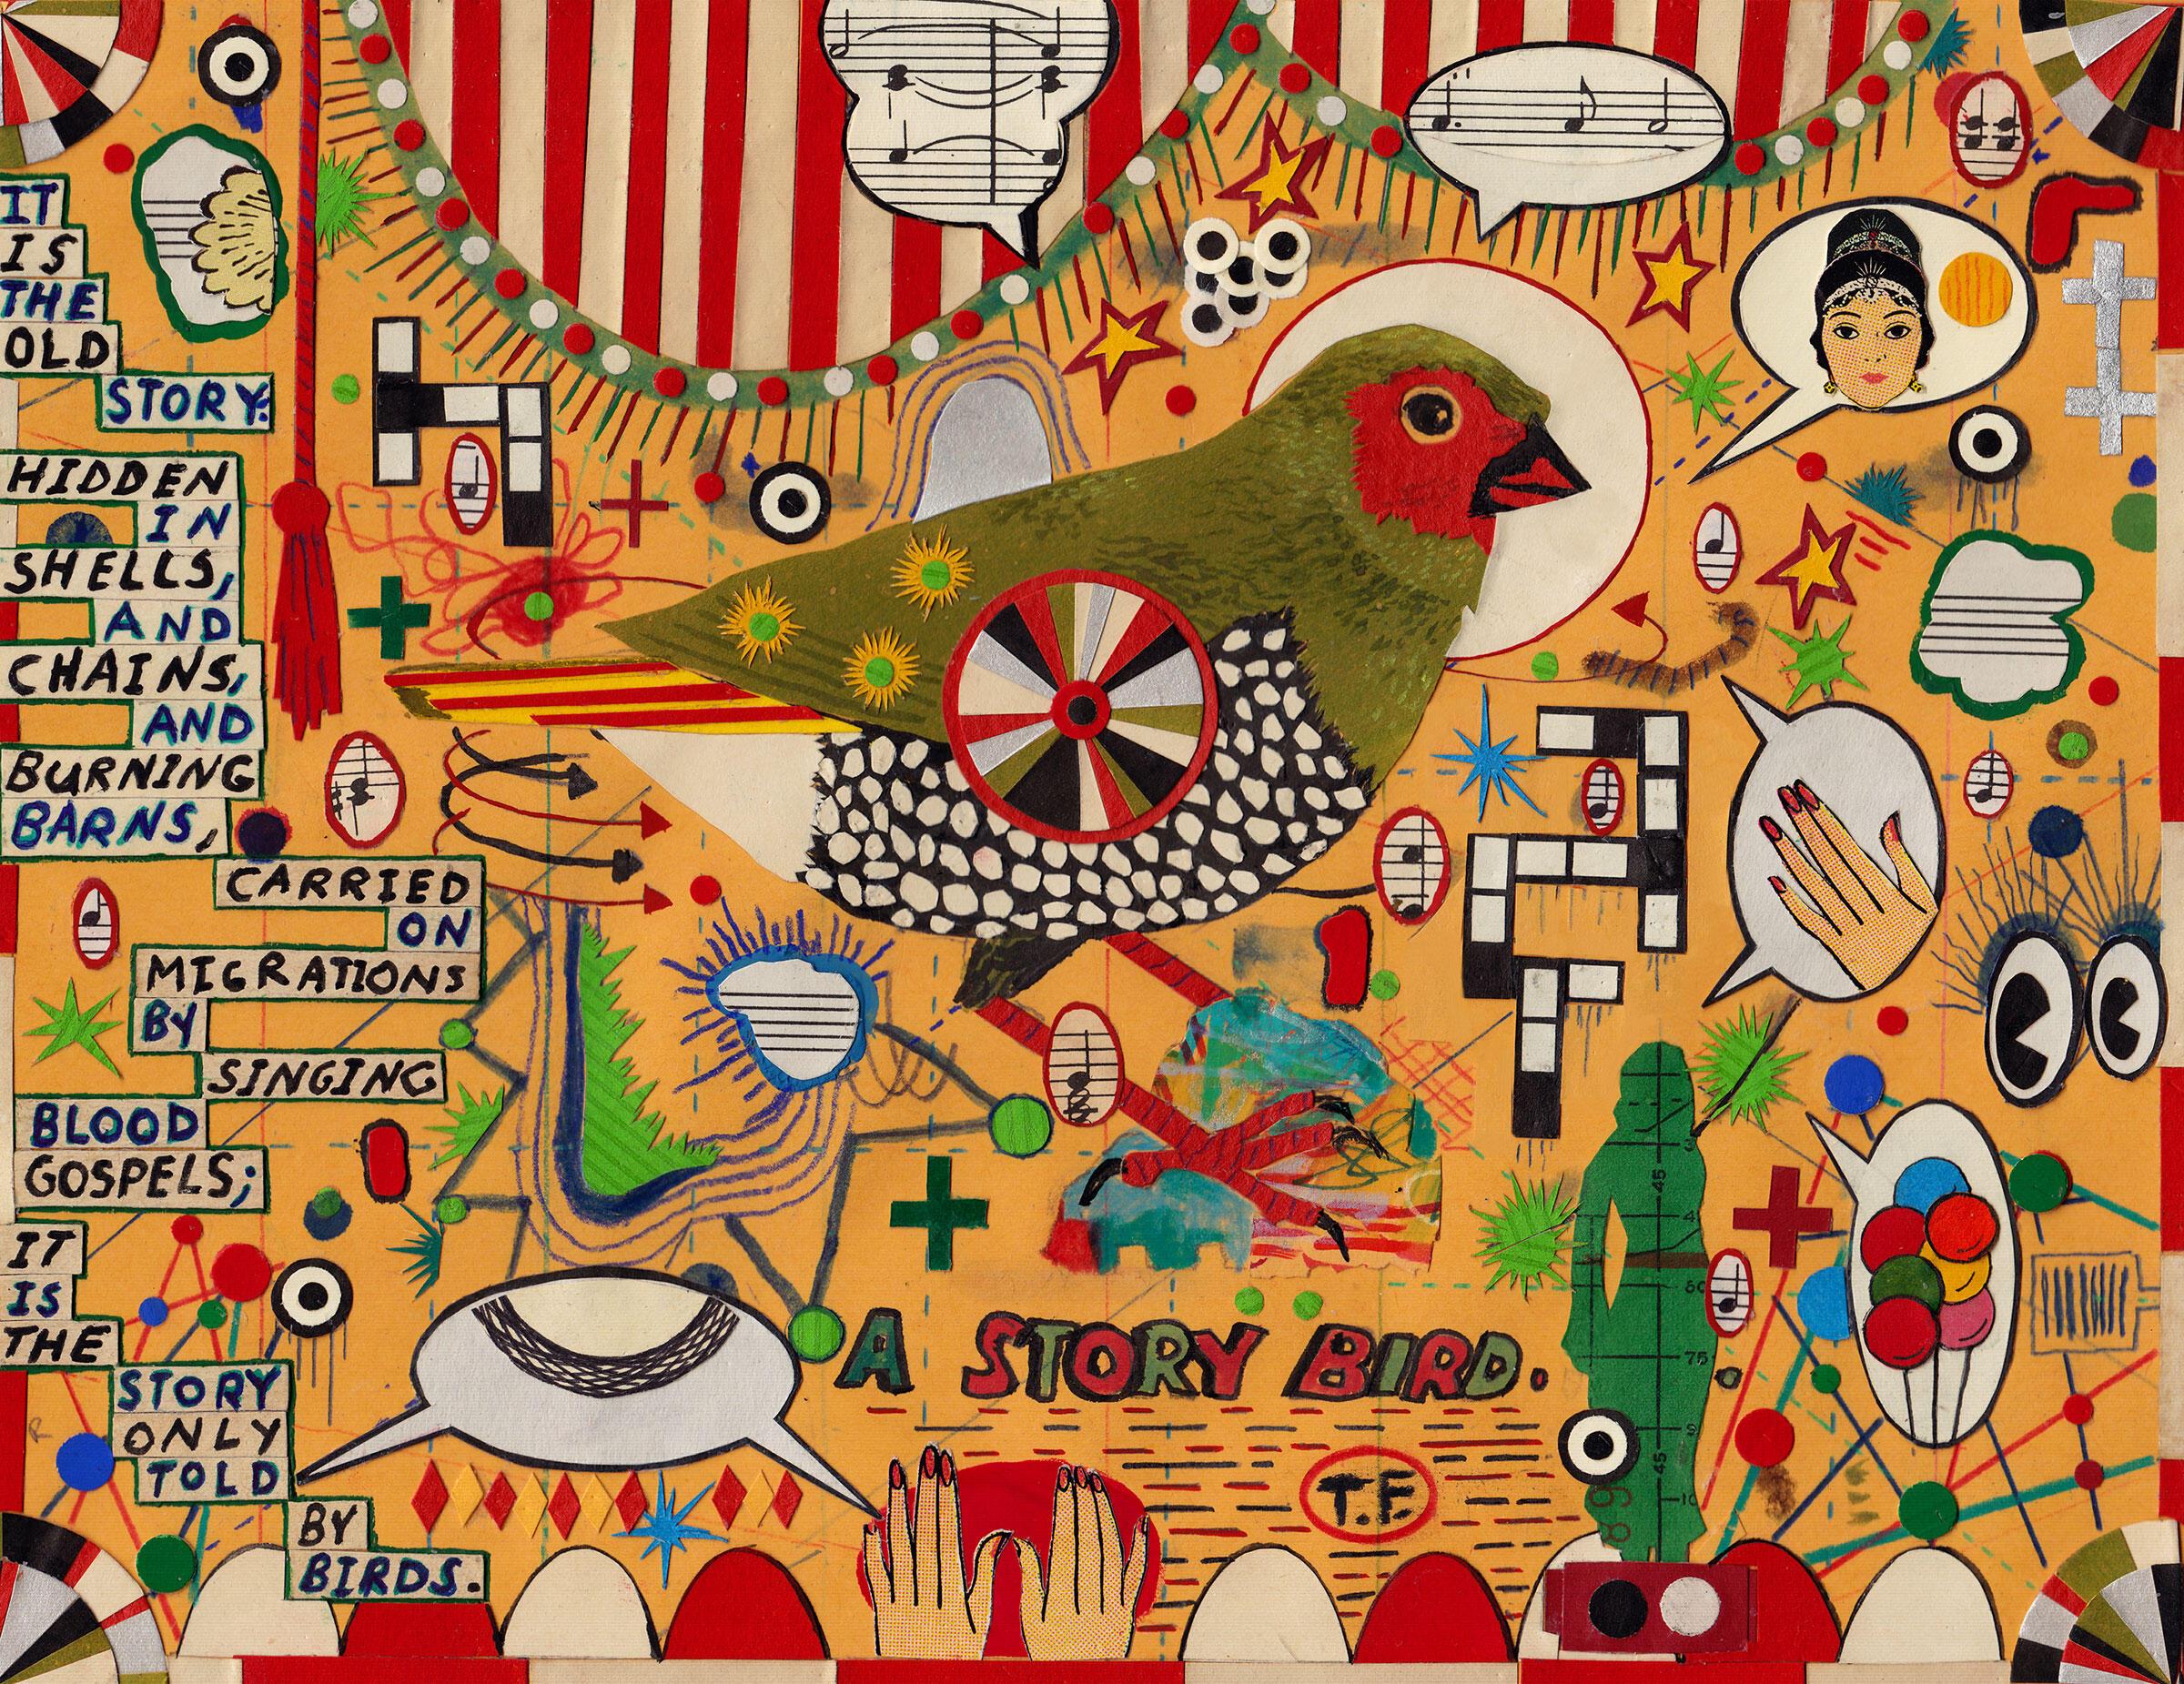 """A Story Bird."" Illustration: Tony Fitzpatrick"